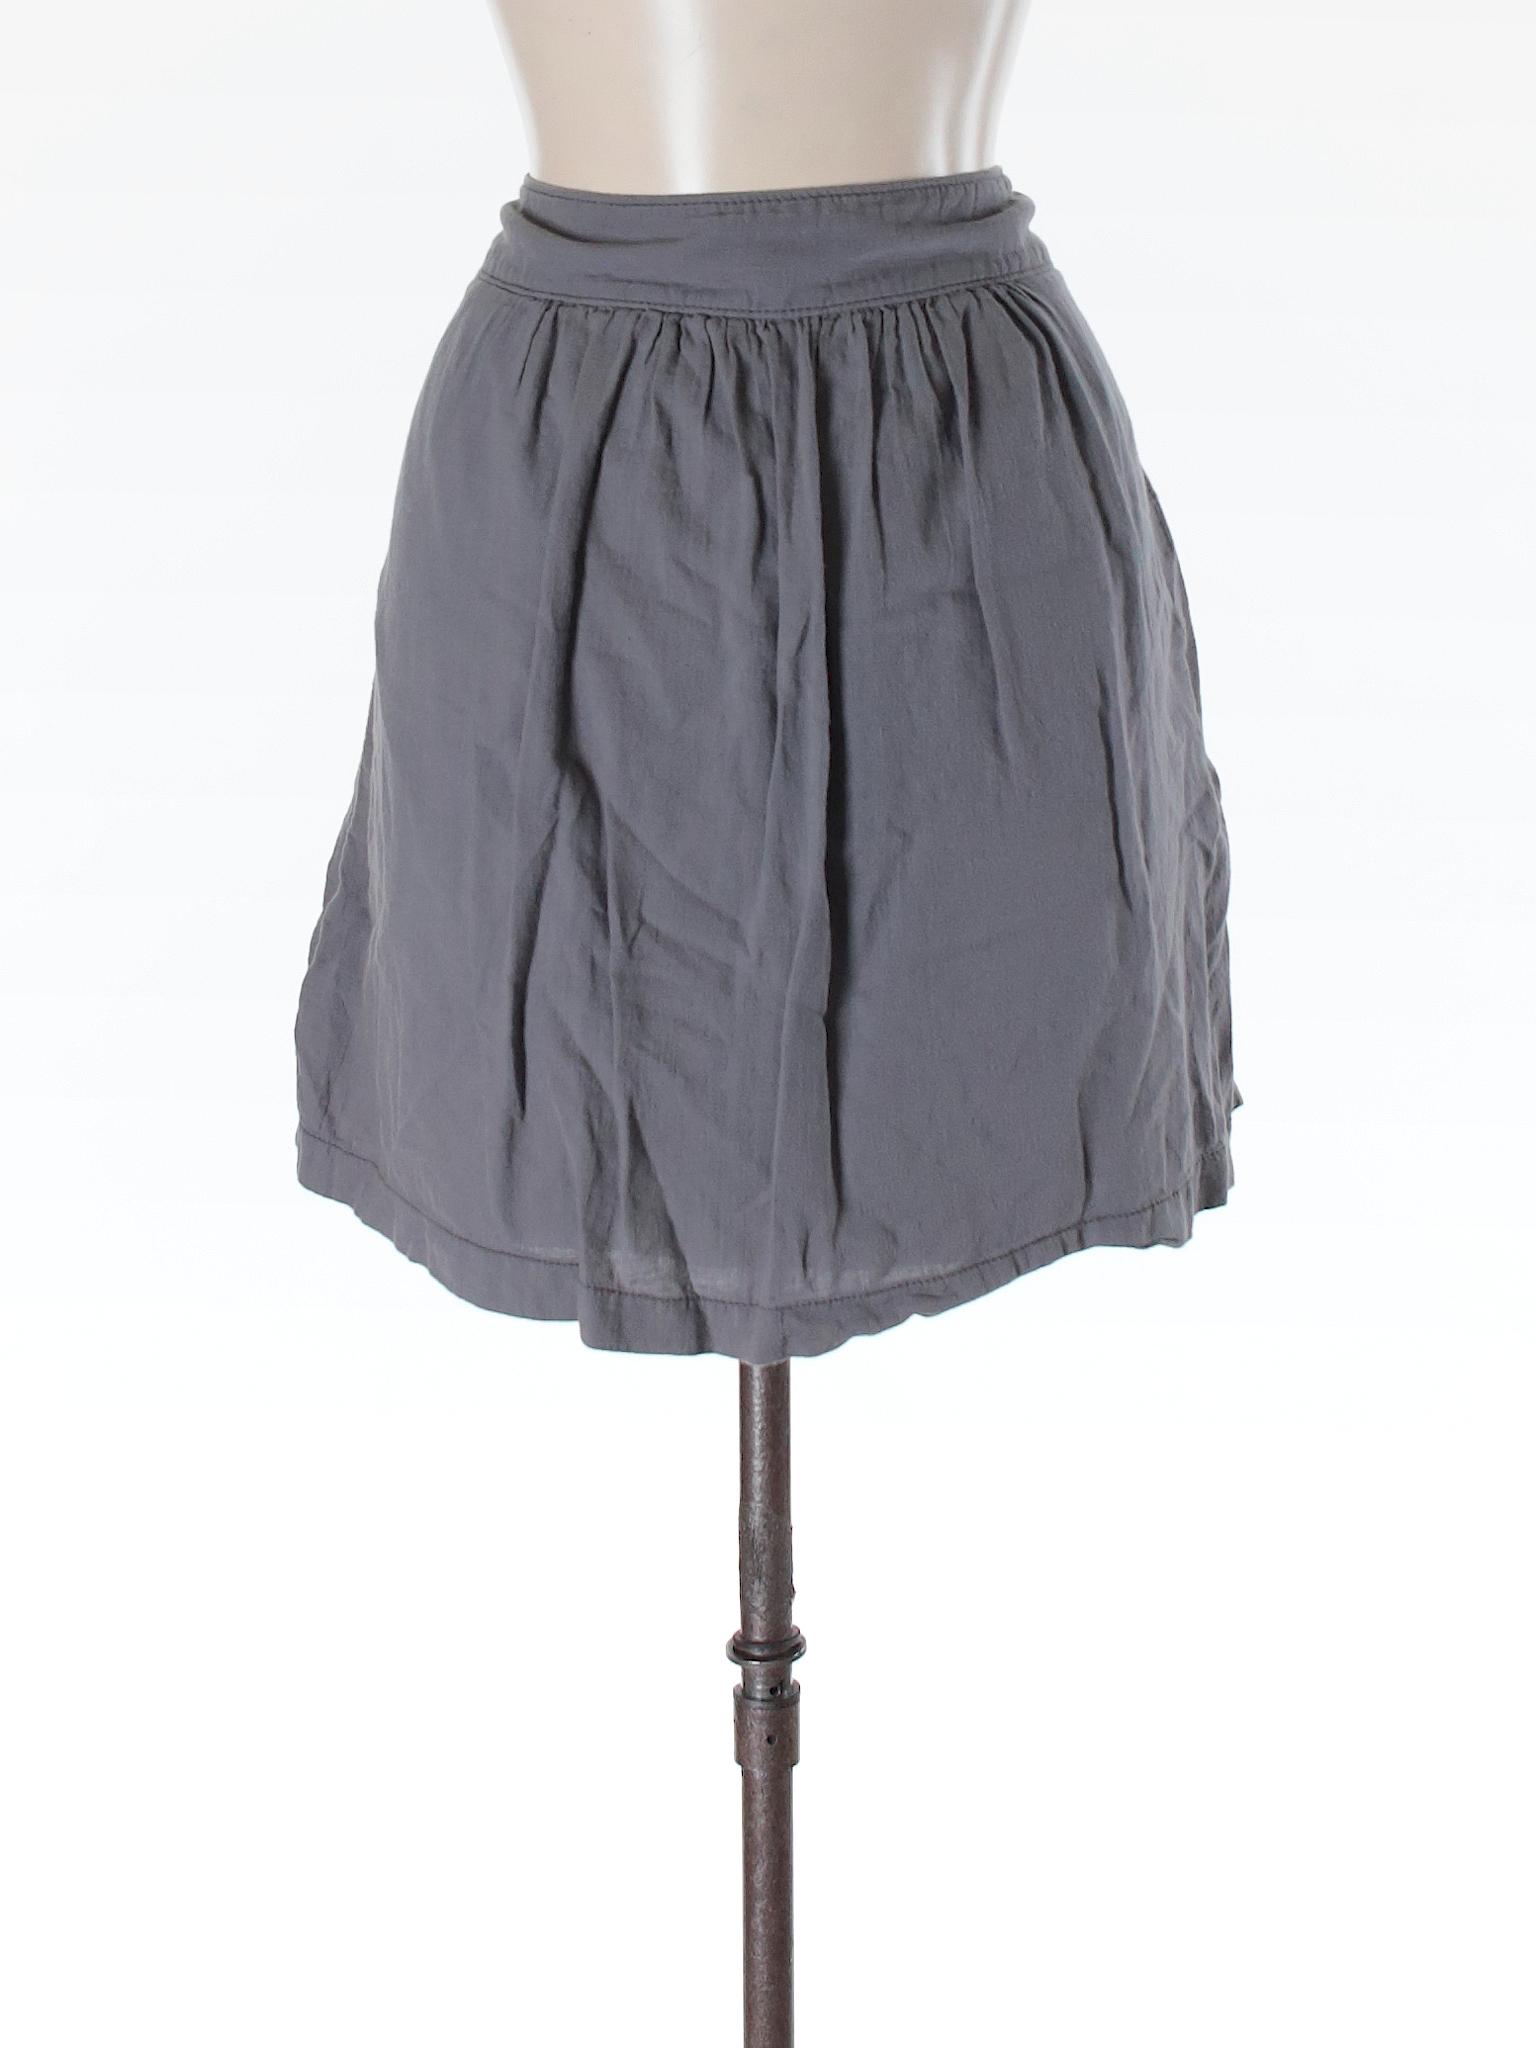 Taylor Winter Skirt Leisure Loft Ann Casual wES4a6Pxq